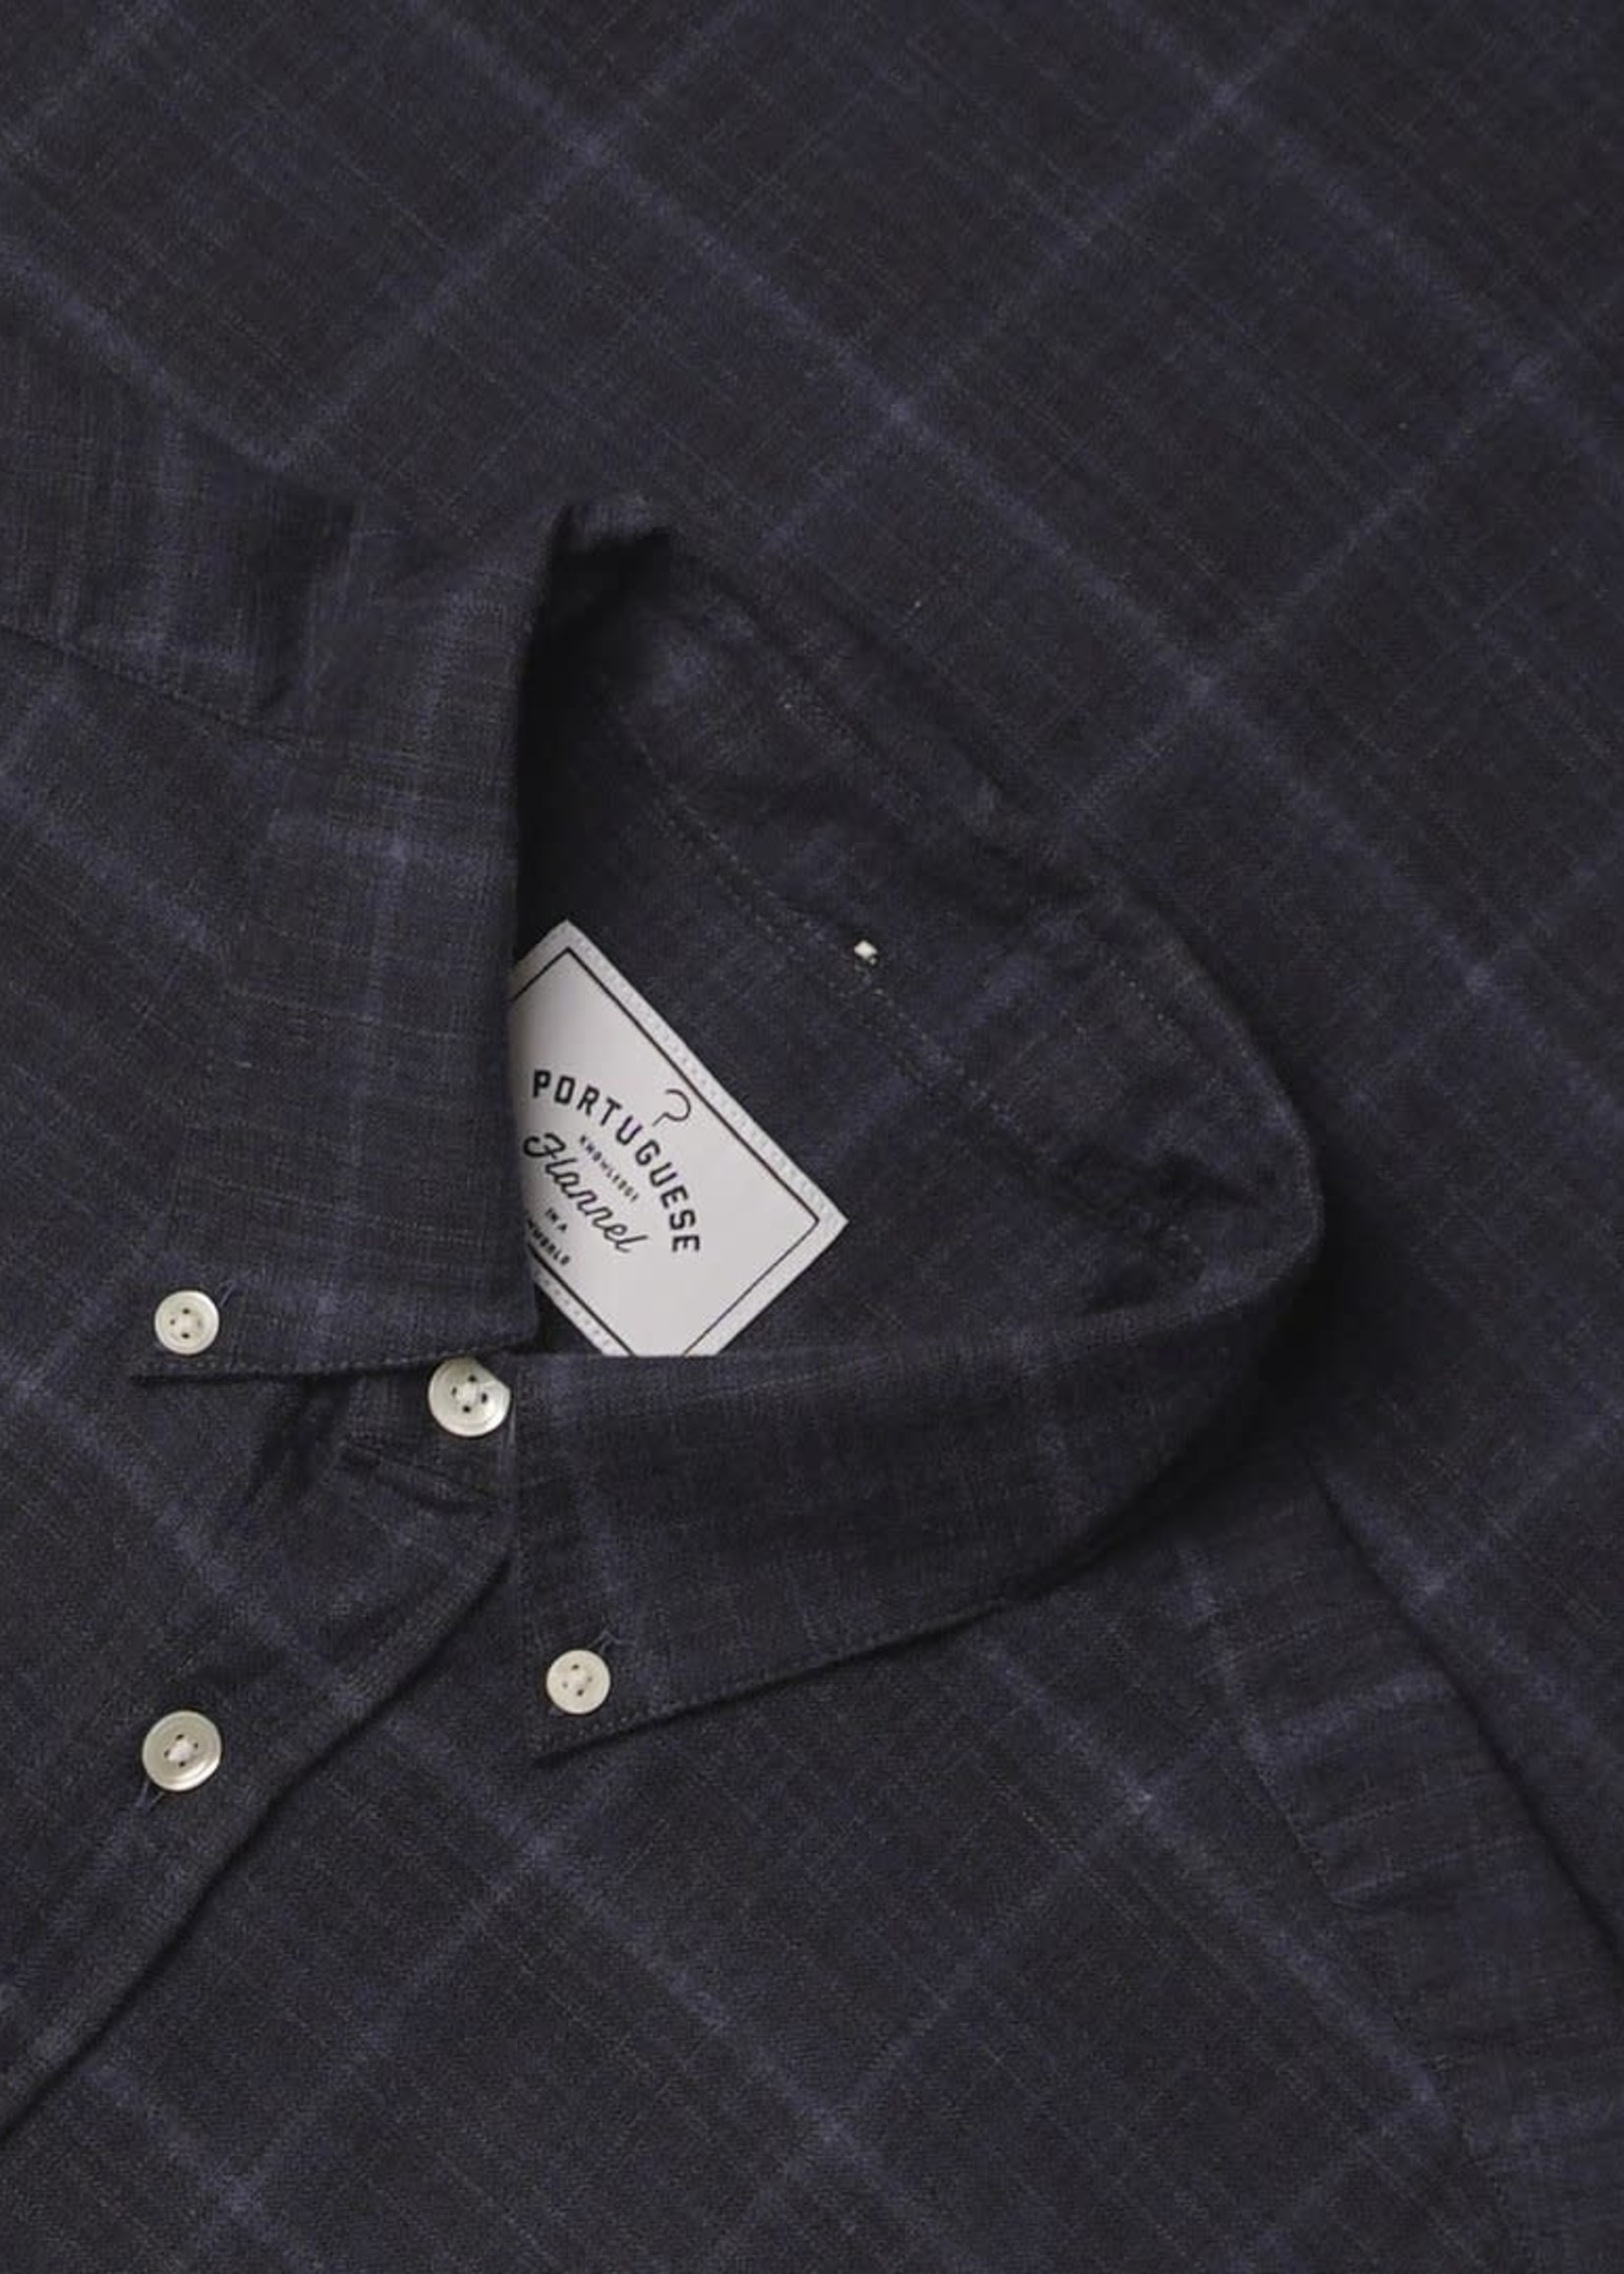 Portuguese Flannel Portuguese Flannel Inside Heater Navy / Blue Plaid Flannel Sport Shirt